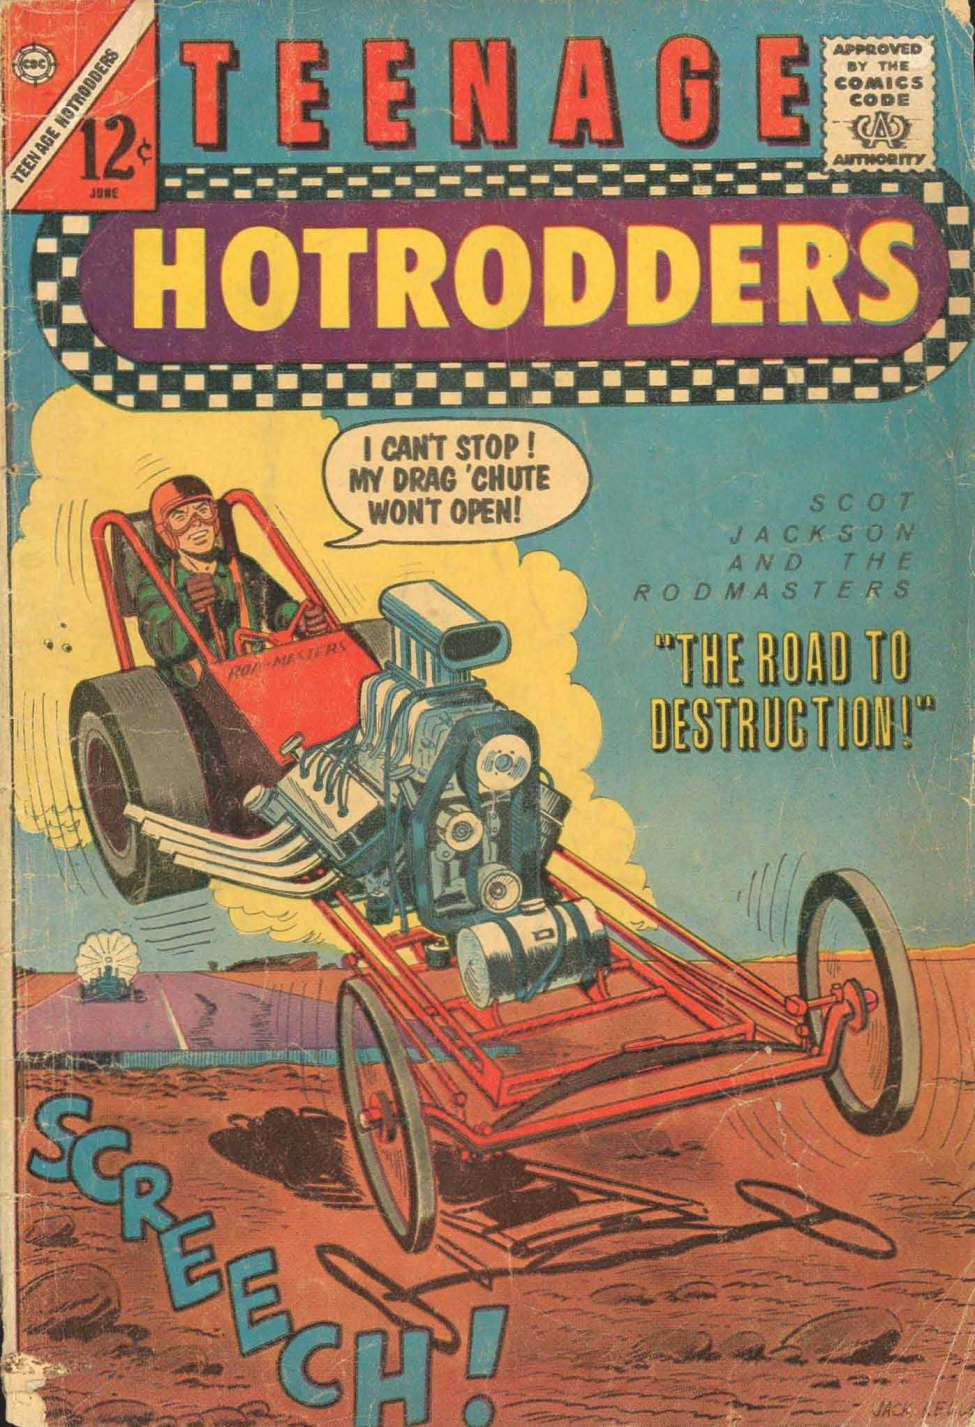 Teenage Hotrodders #2 (Charlton) - Comic Book Plus